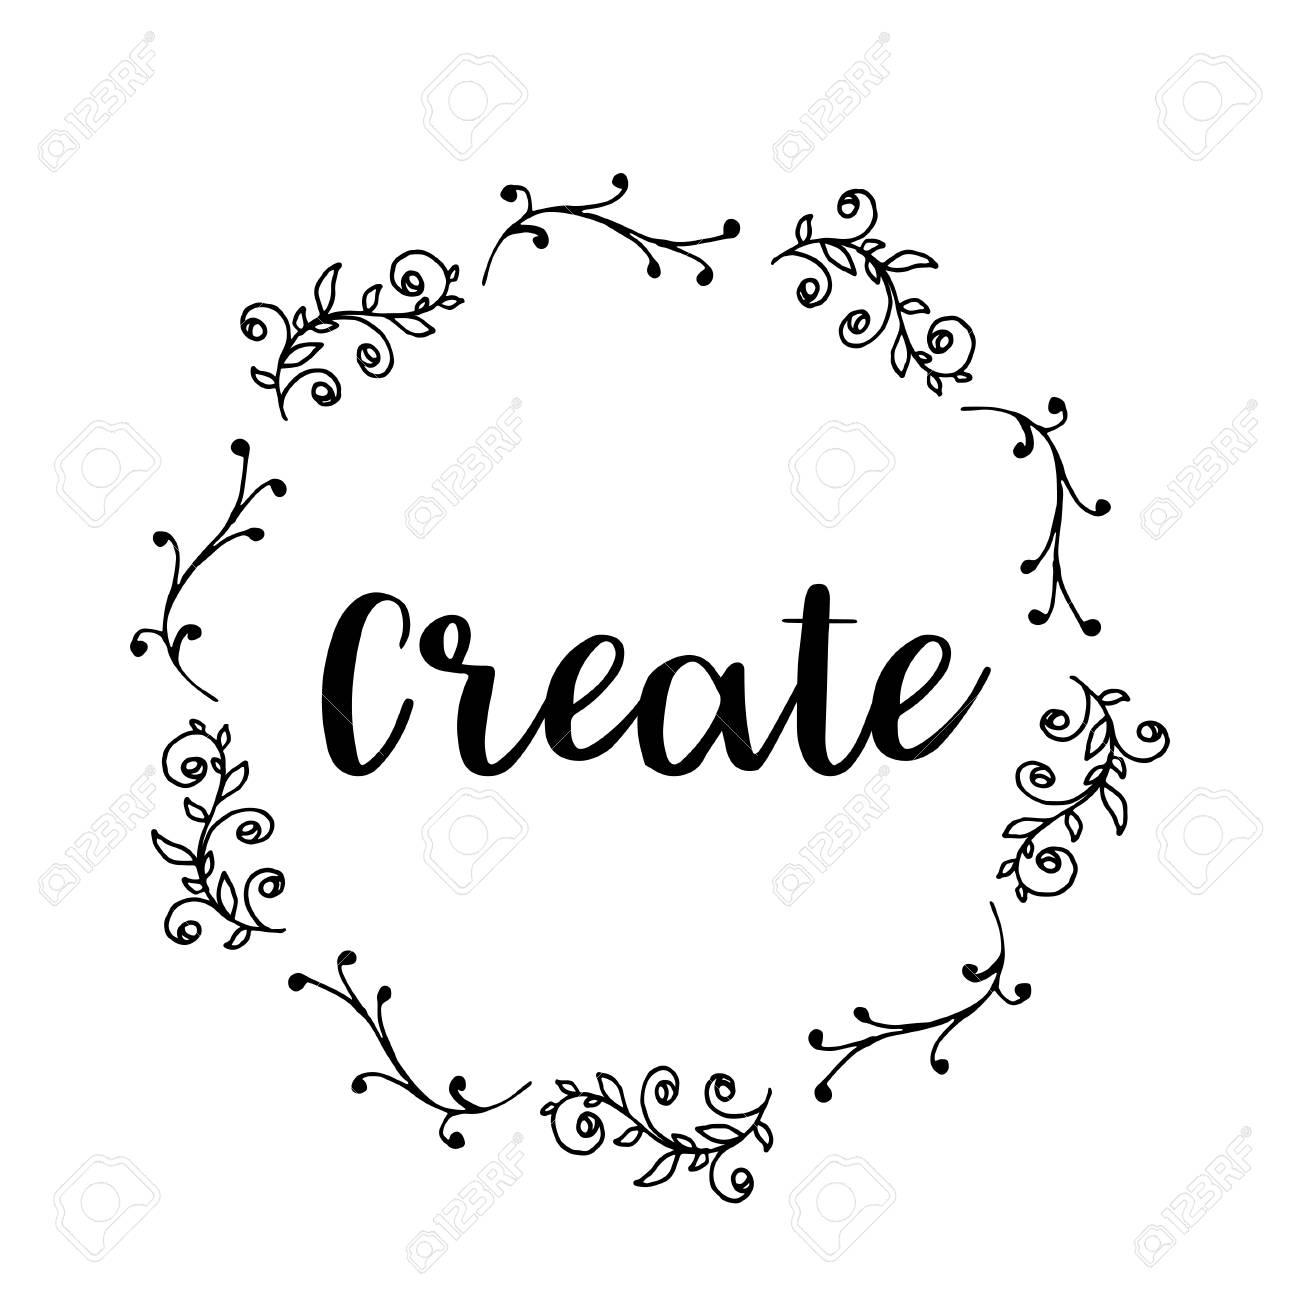 Create Text Flower Wreath Hand Drawn Laurel Greeting Card Design